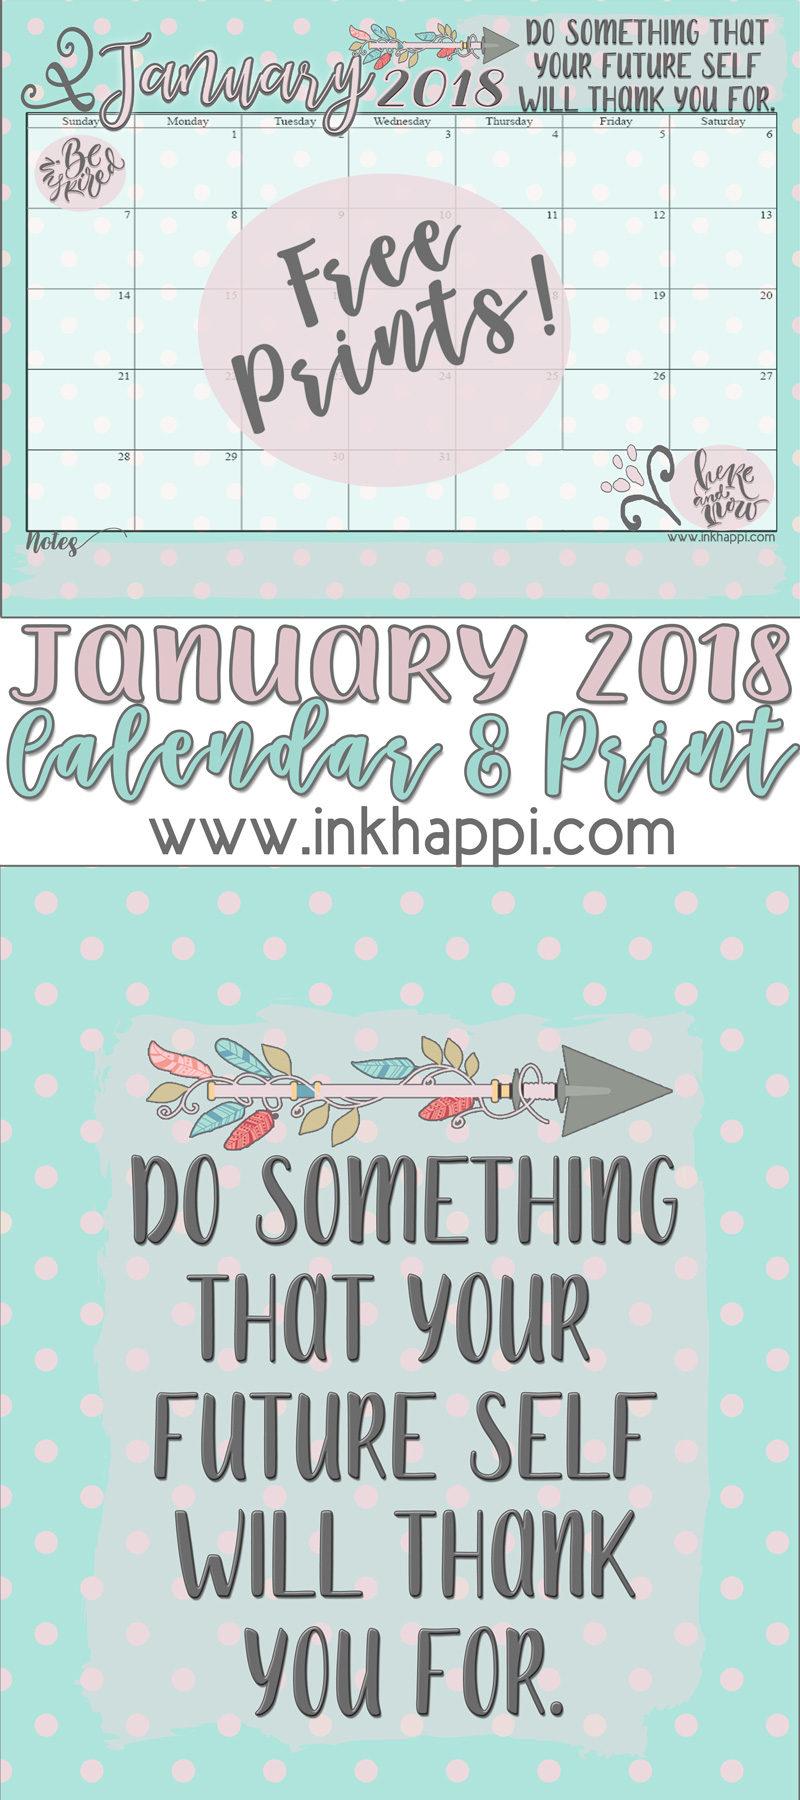 January 2018 Calendar and motivational print from inkhappi. #freeprintables #calendar #motivation